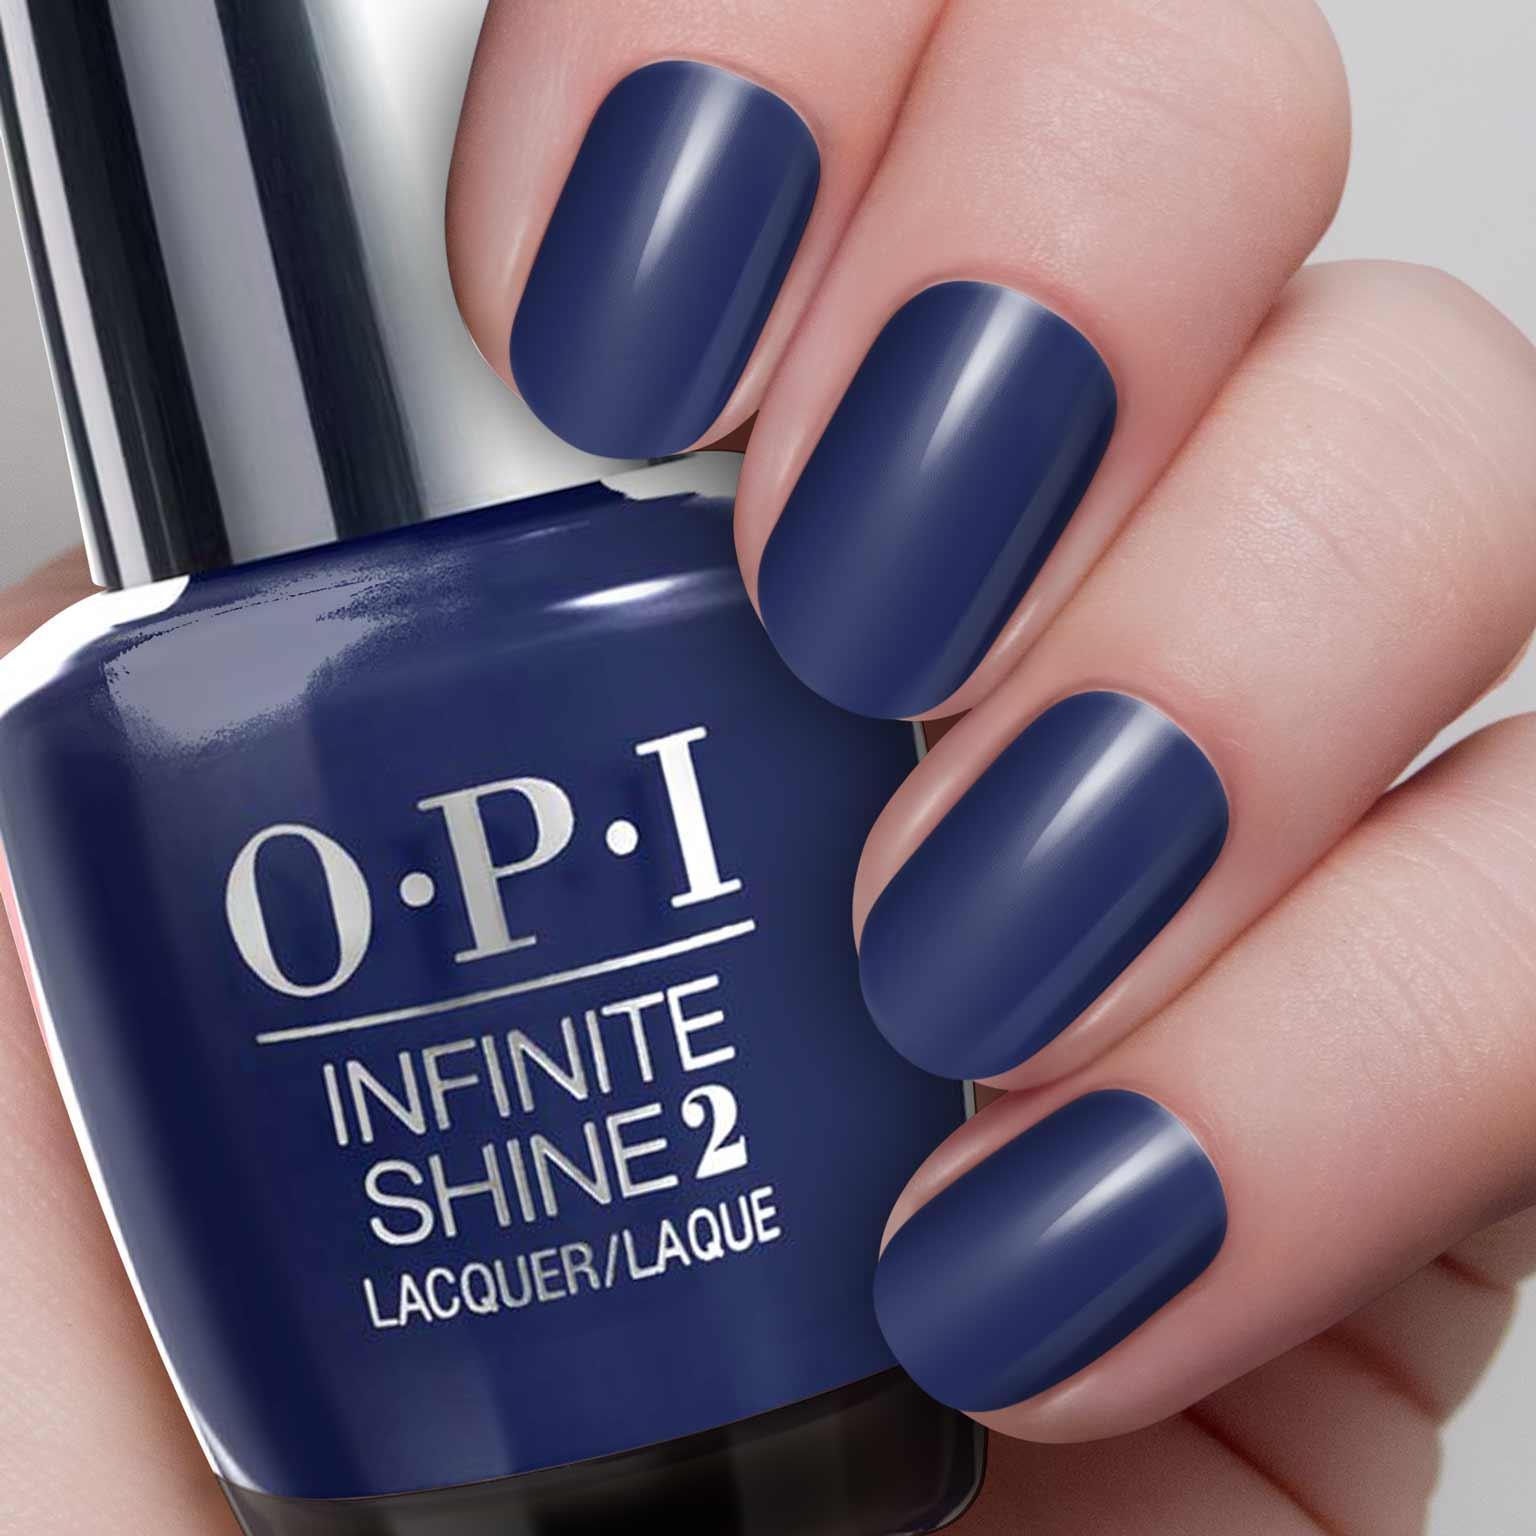 OPI Infinite shine.jpg